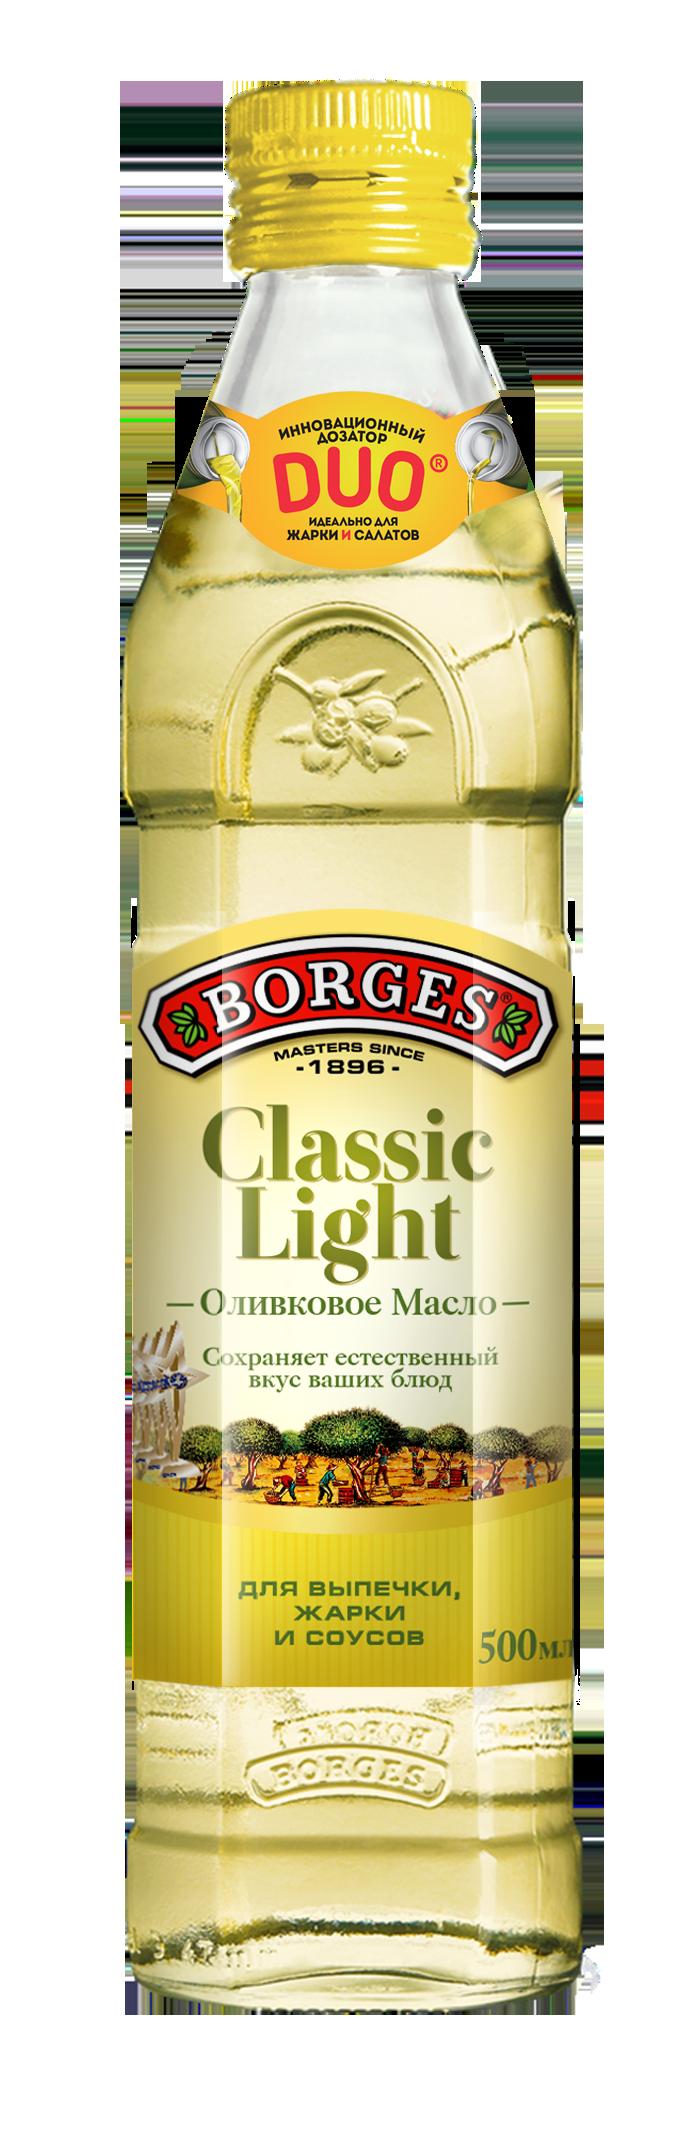 Оливковые масла Classic (для жарки и запекания) CLASSIC LIGHT